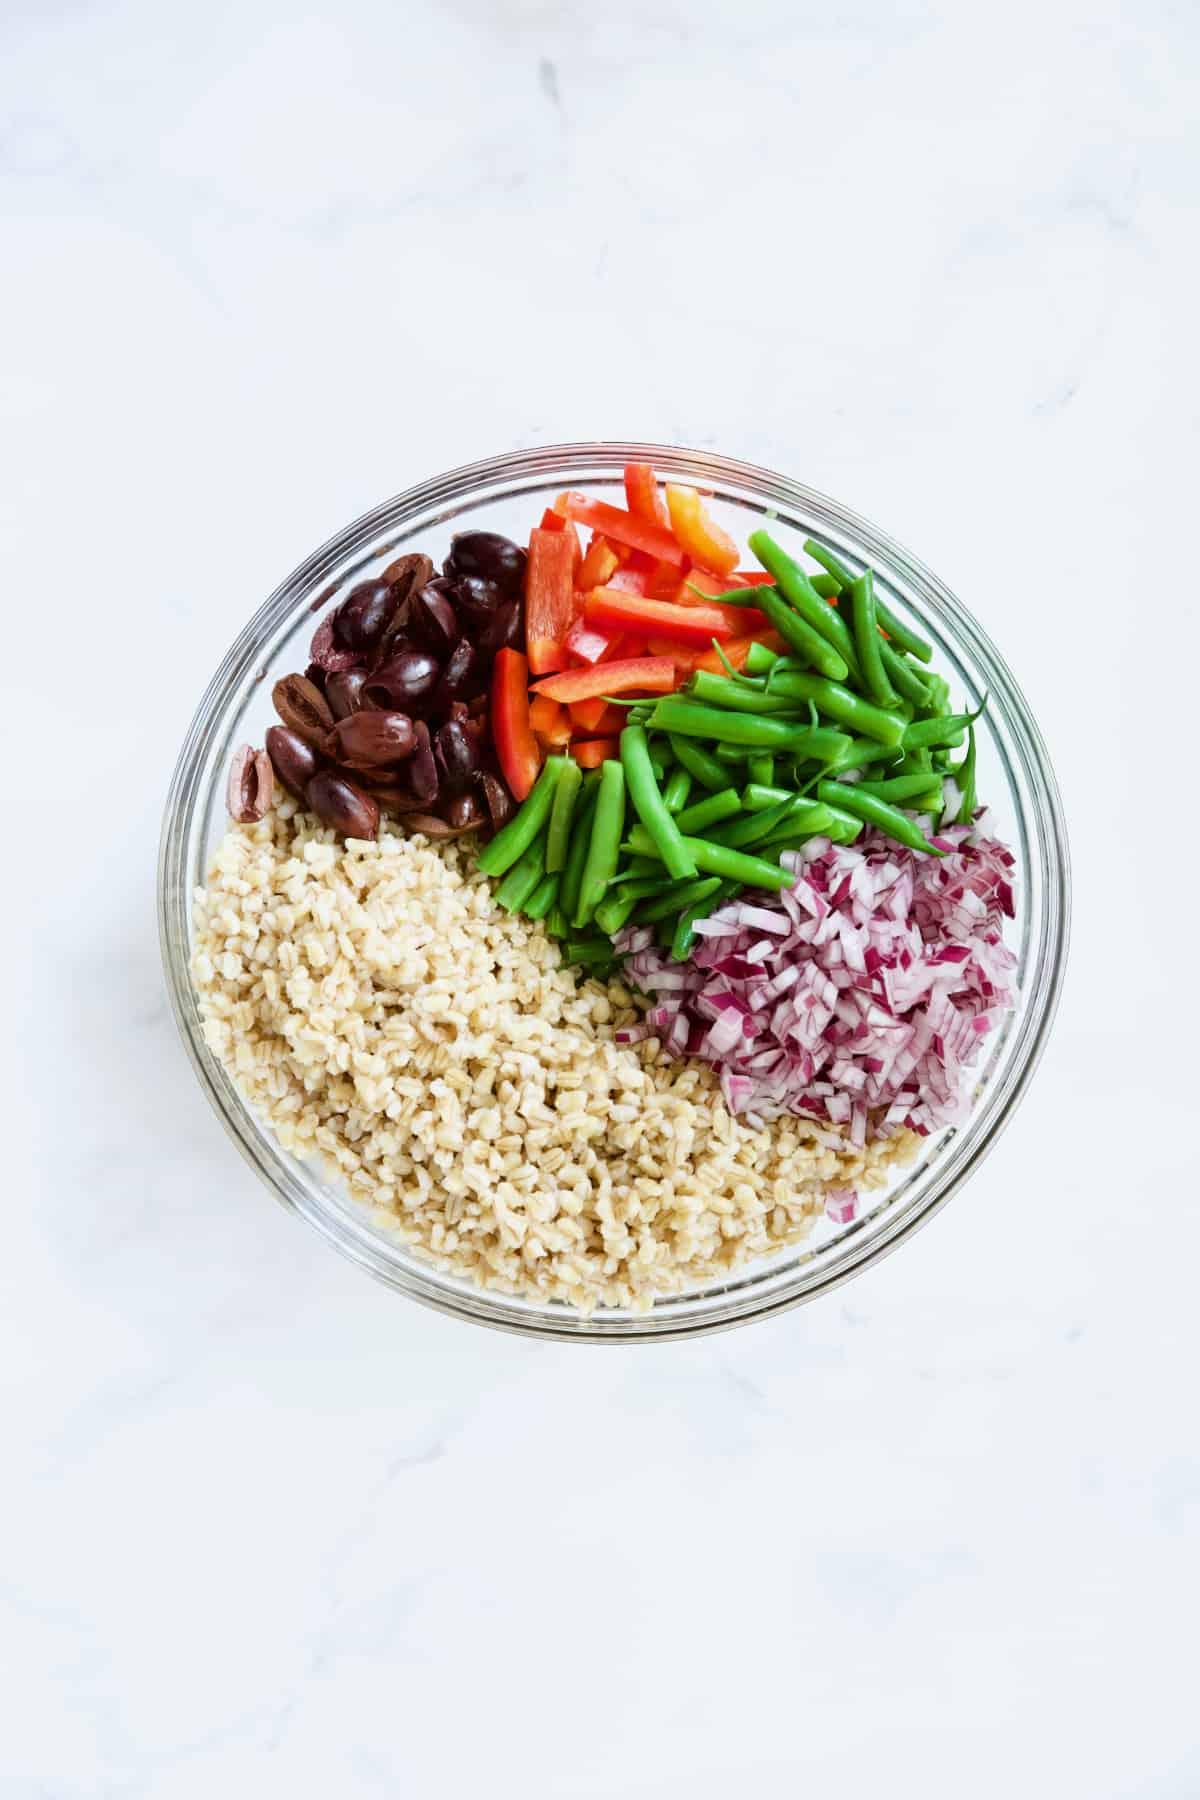 Ingredients for Mediterranean Barley Salad in glass bowl not yet stirred together.